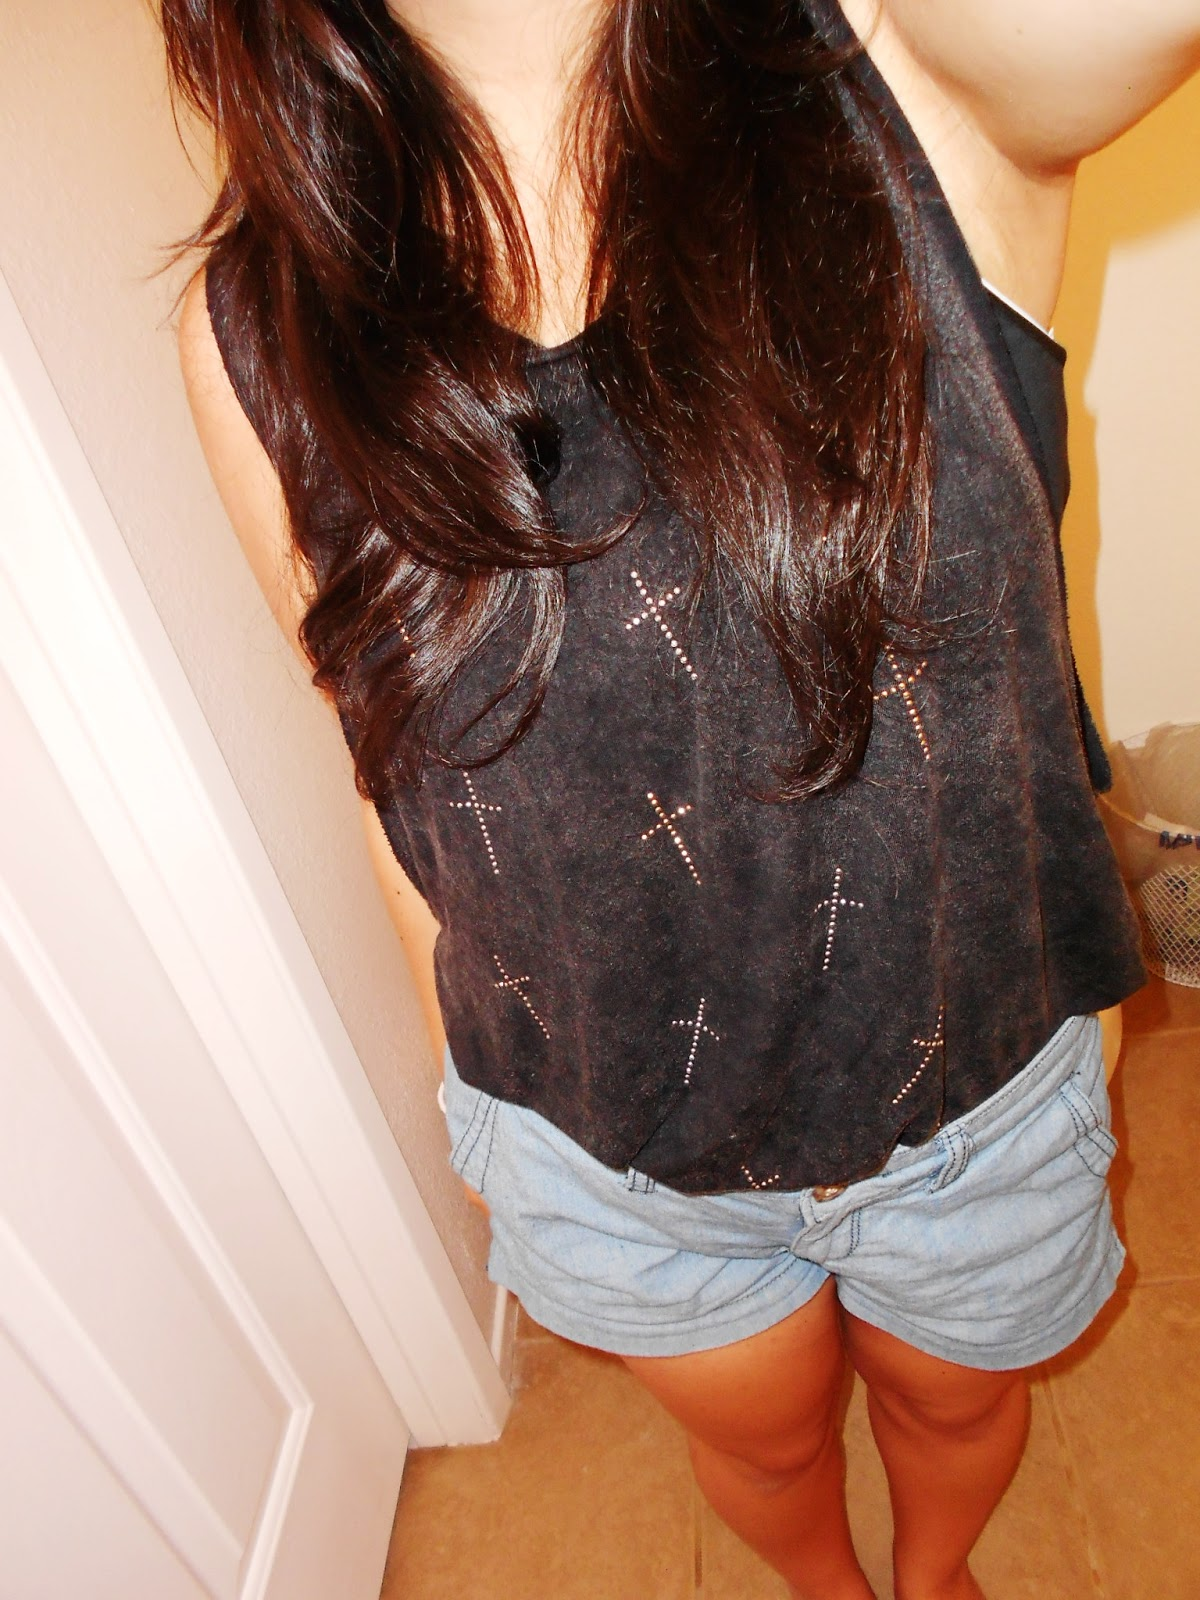 Eleanor calder straight hair